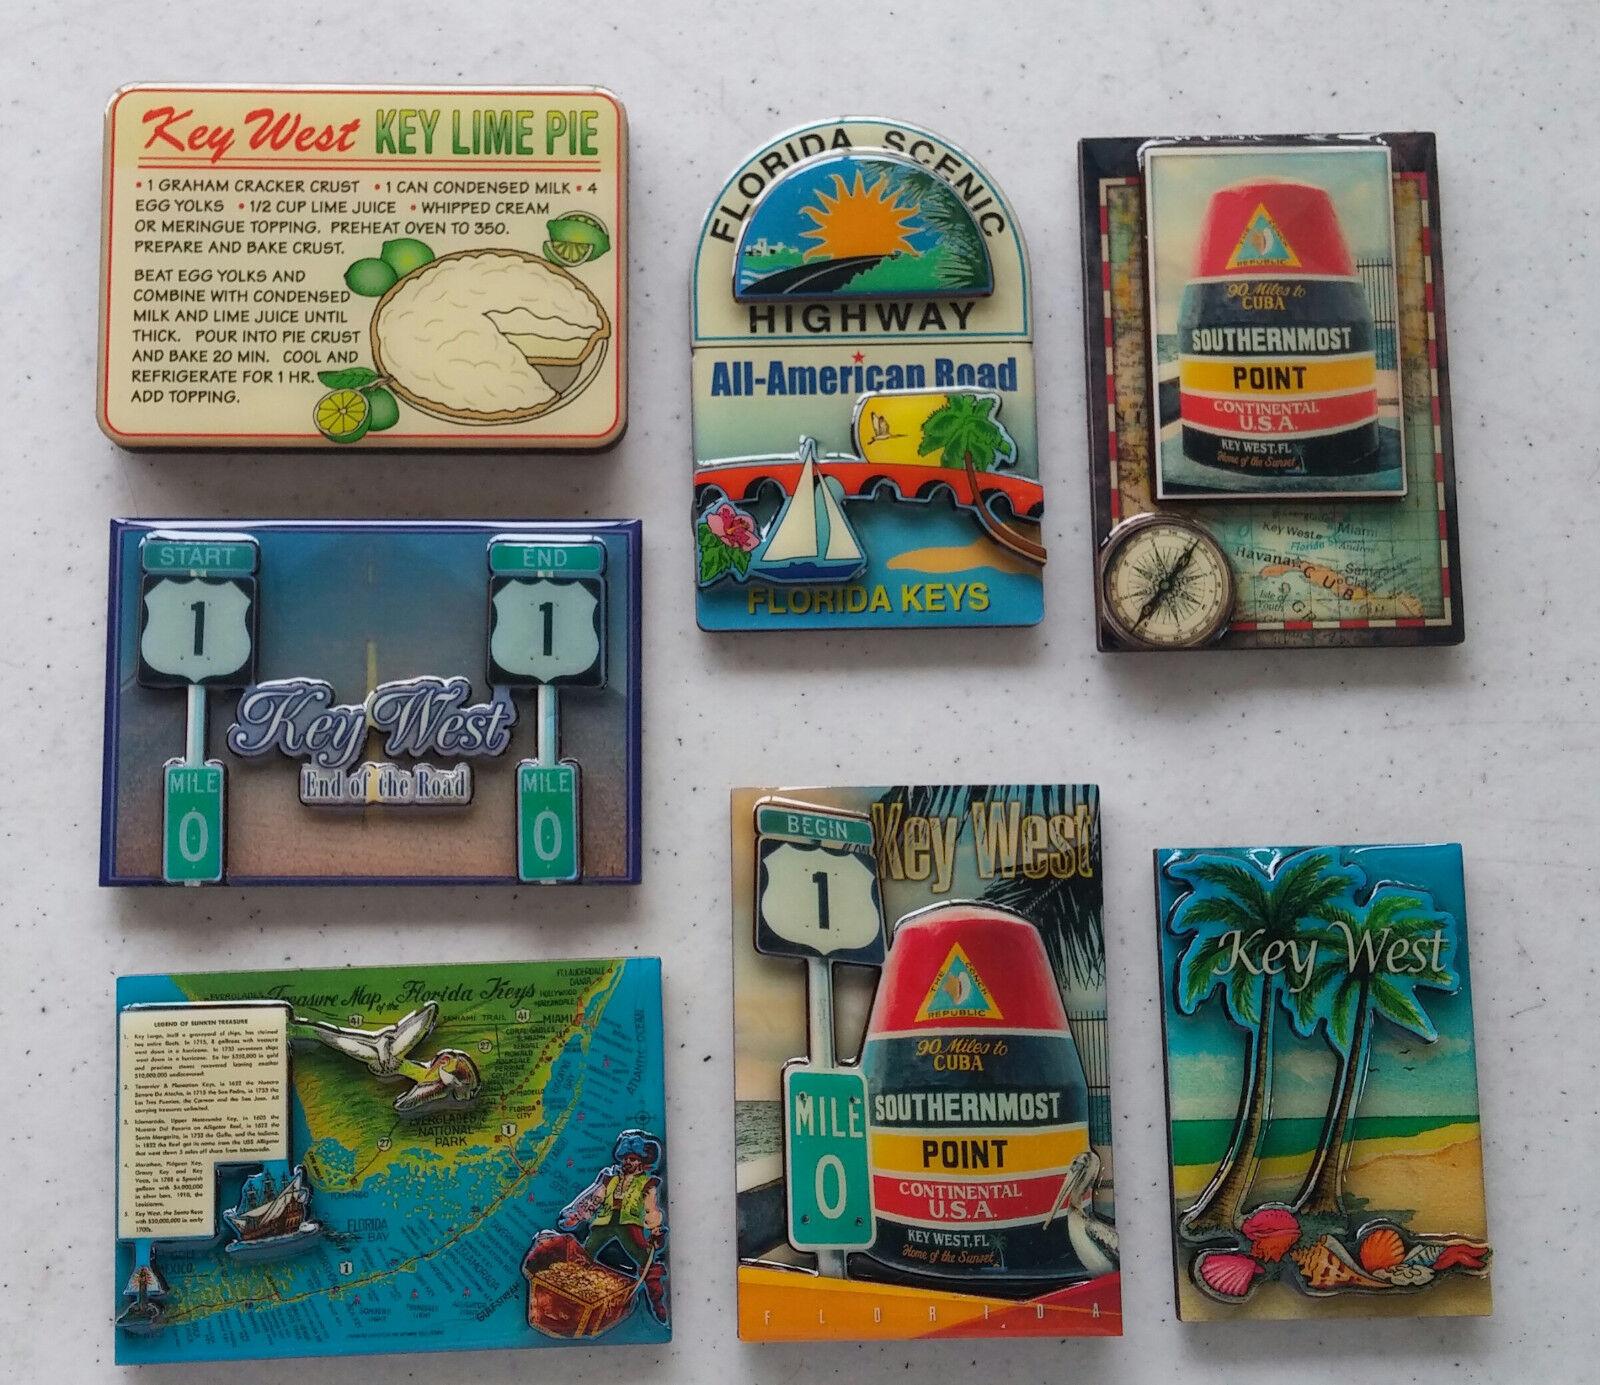 Key West 3 D Magnets Florida Keys SMP Mile 0 End US 1 Palm Tree Scenic FREE SHIP